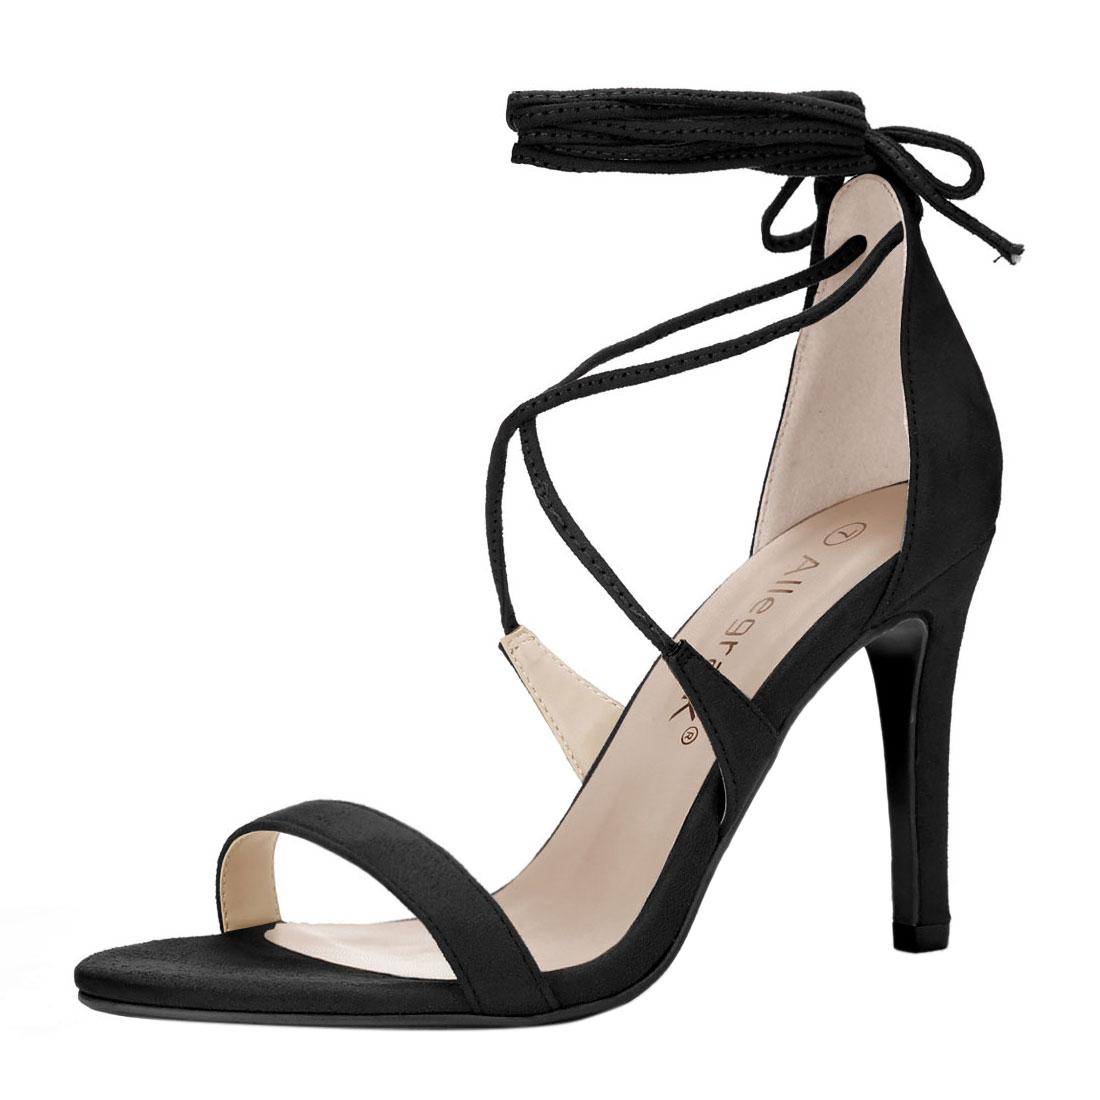 Women Open Toe Stiletto High Heel Lace-Up Sandals Black US 5